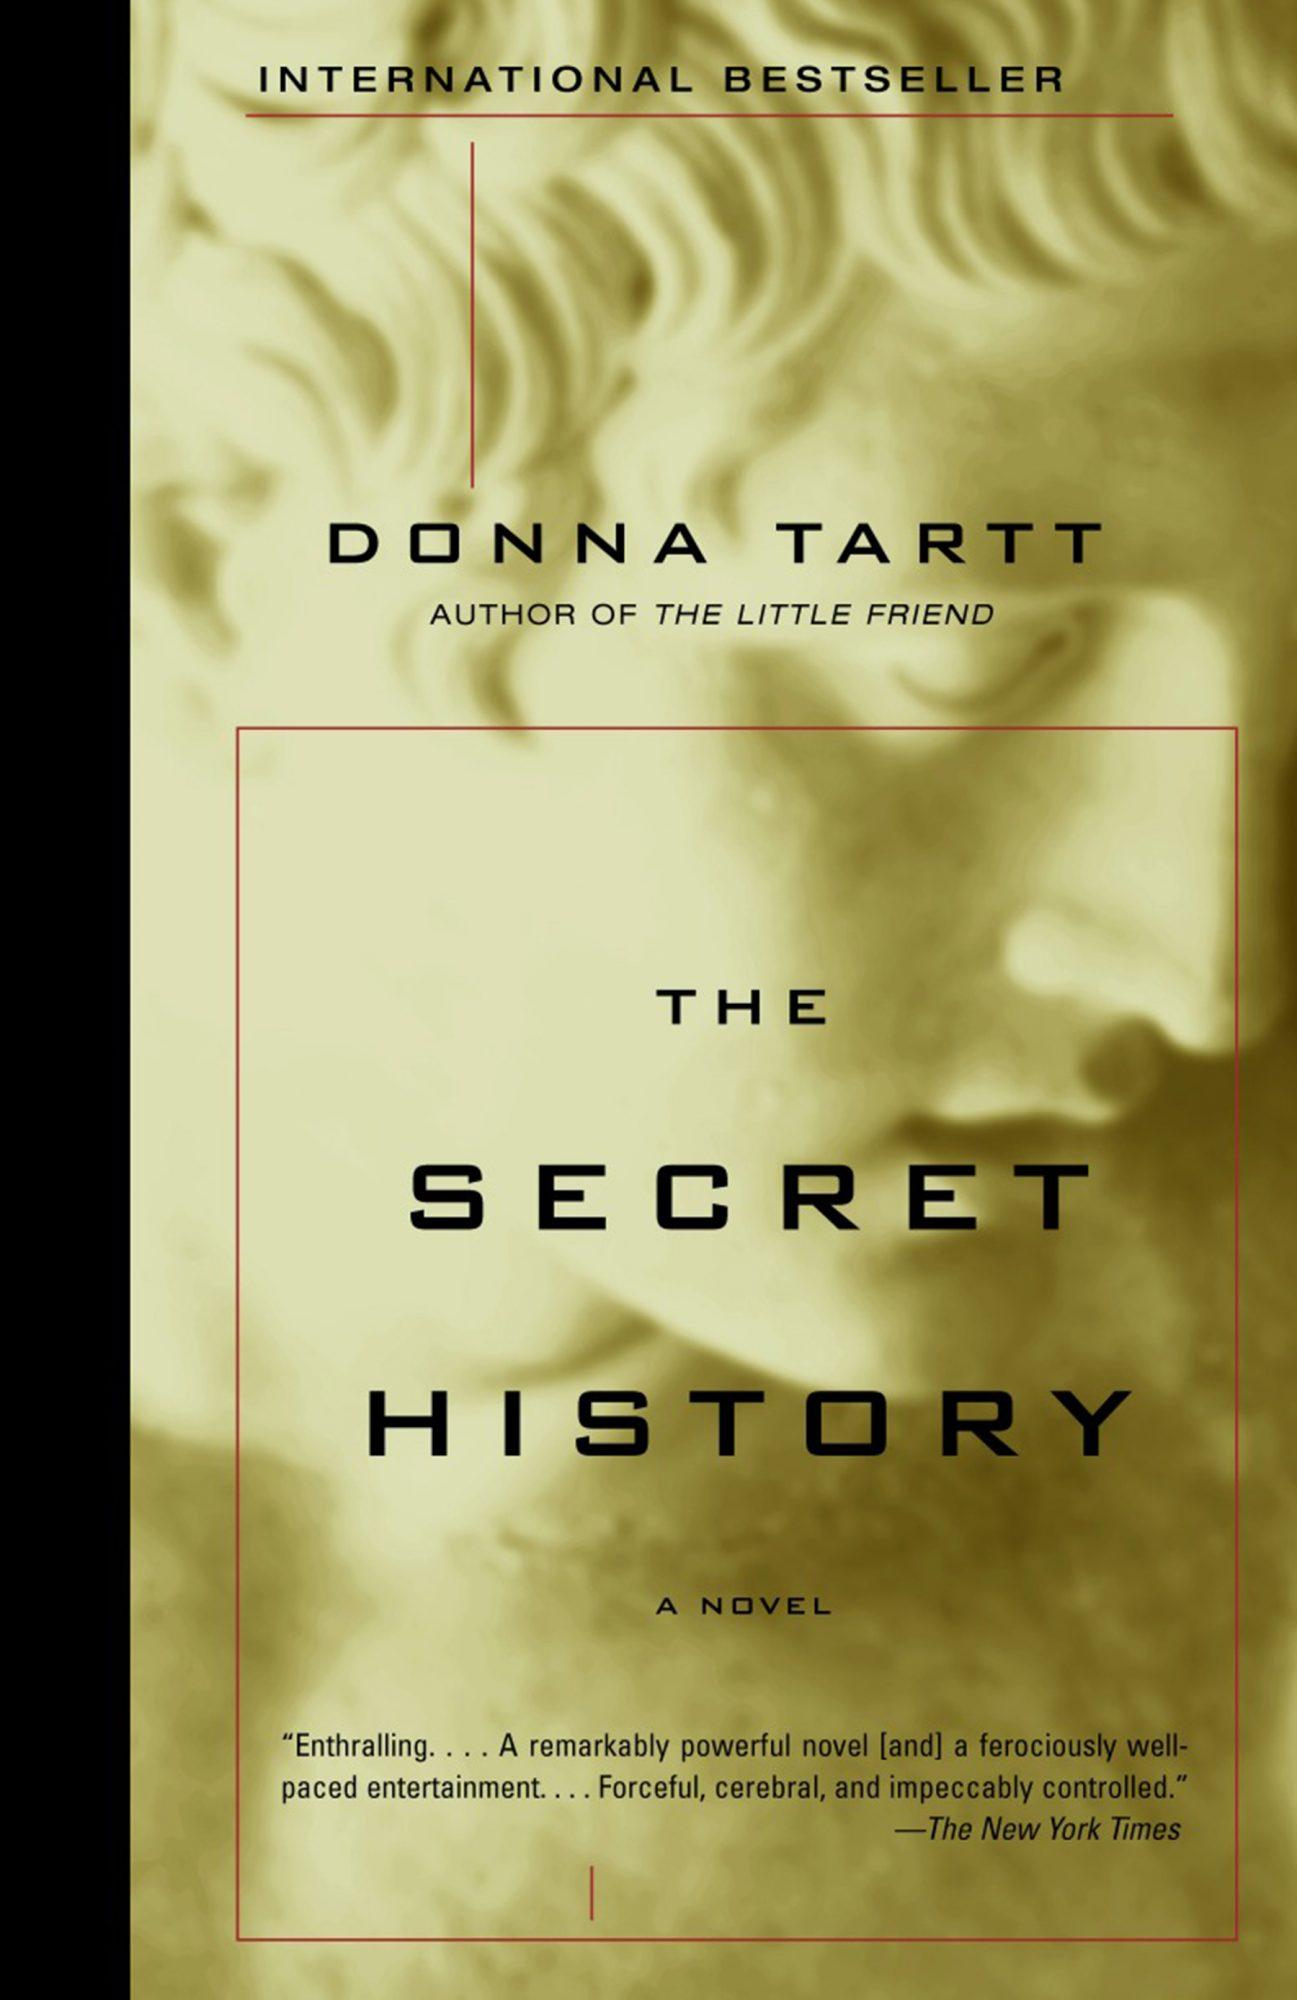 The Secret History  (4/13/04)Donna Tartt